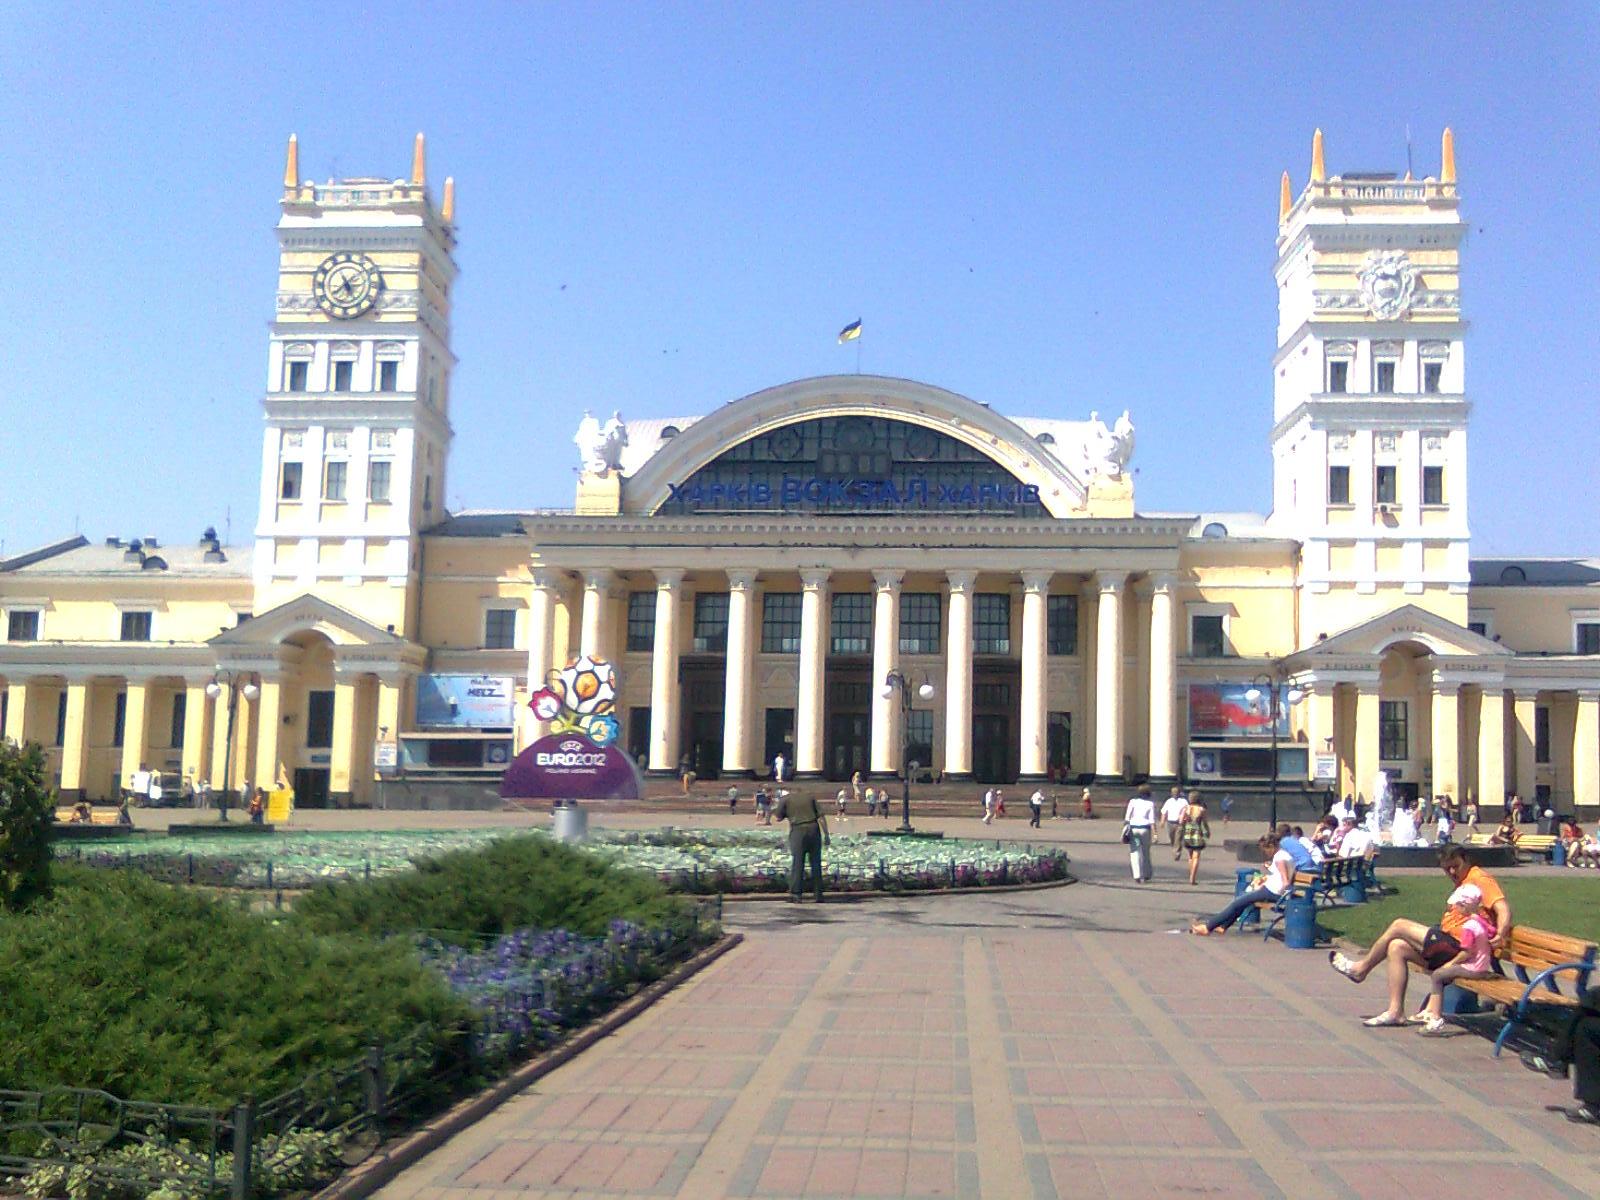 ЖД вокзал в Минске Фото адрес и телефоны